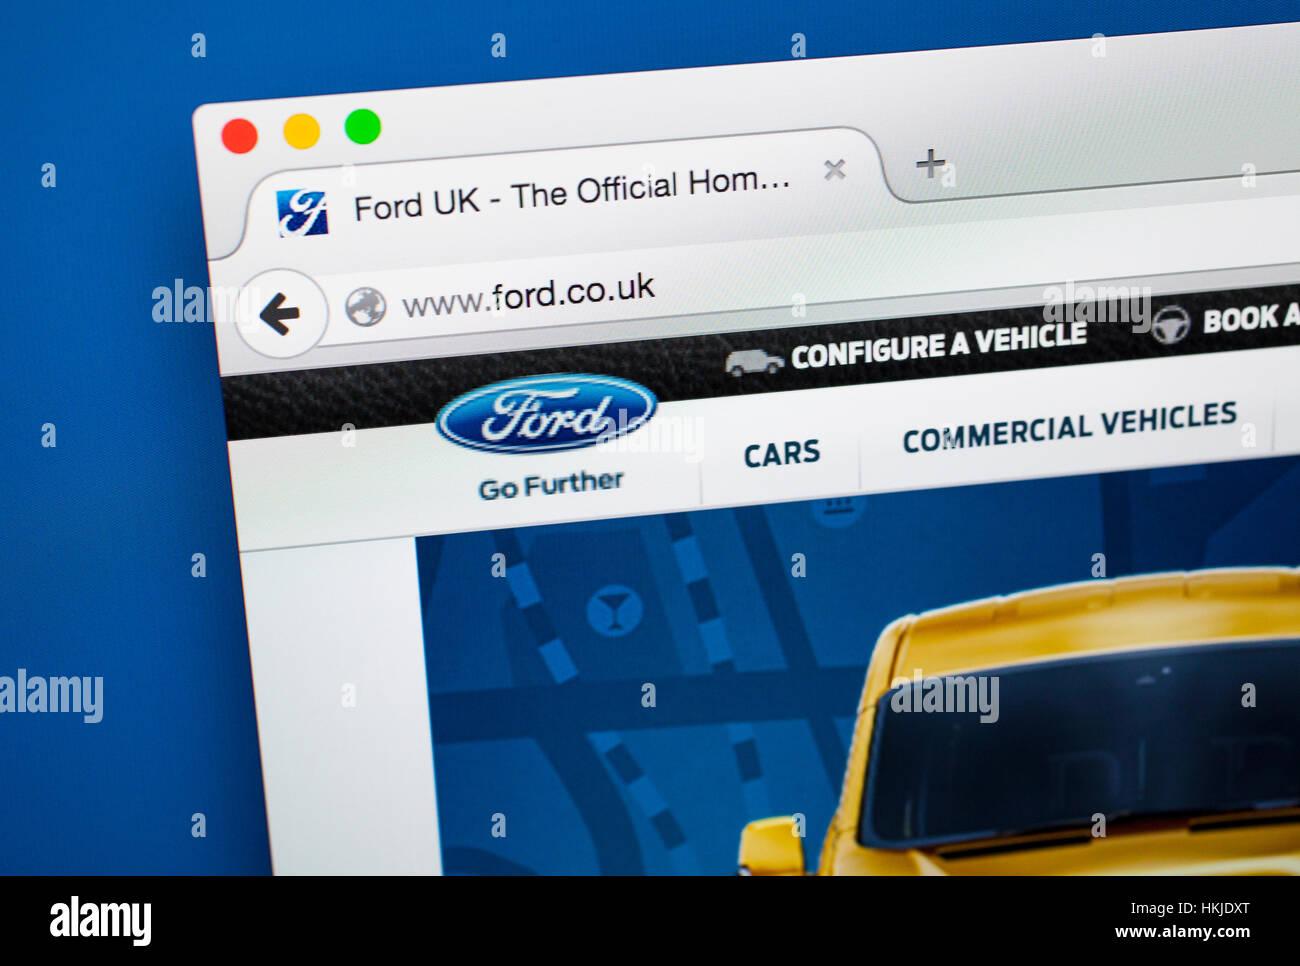 LONDON, UK - Oktober 22. Oktober 2015: die Homepage der offiziellen Website der Ford Motor Company, am 22. Oktober Stockbild